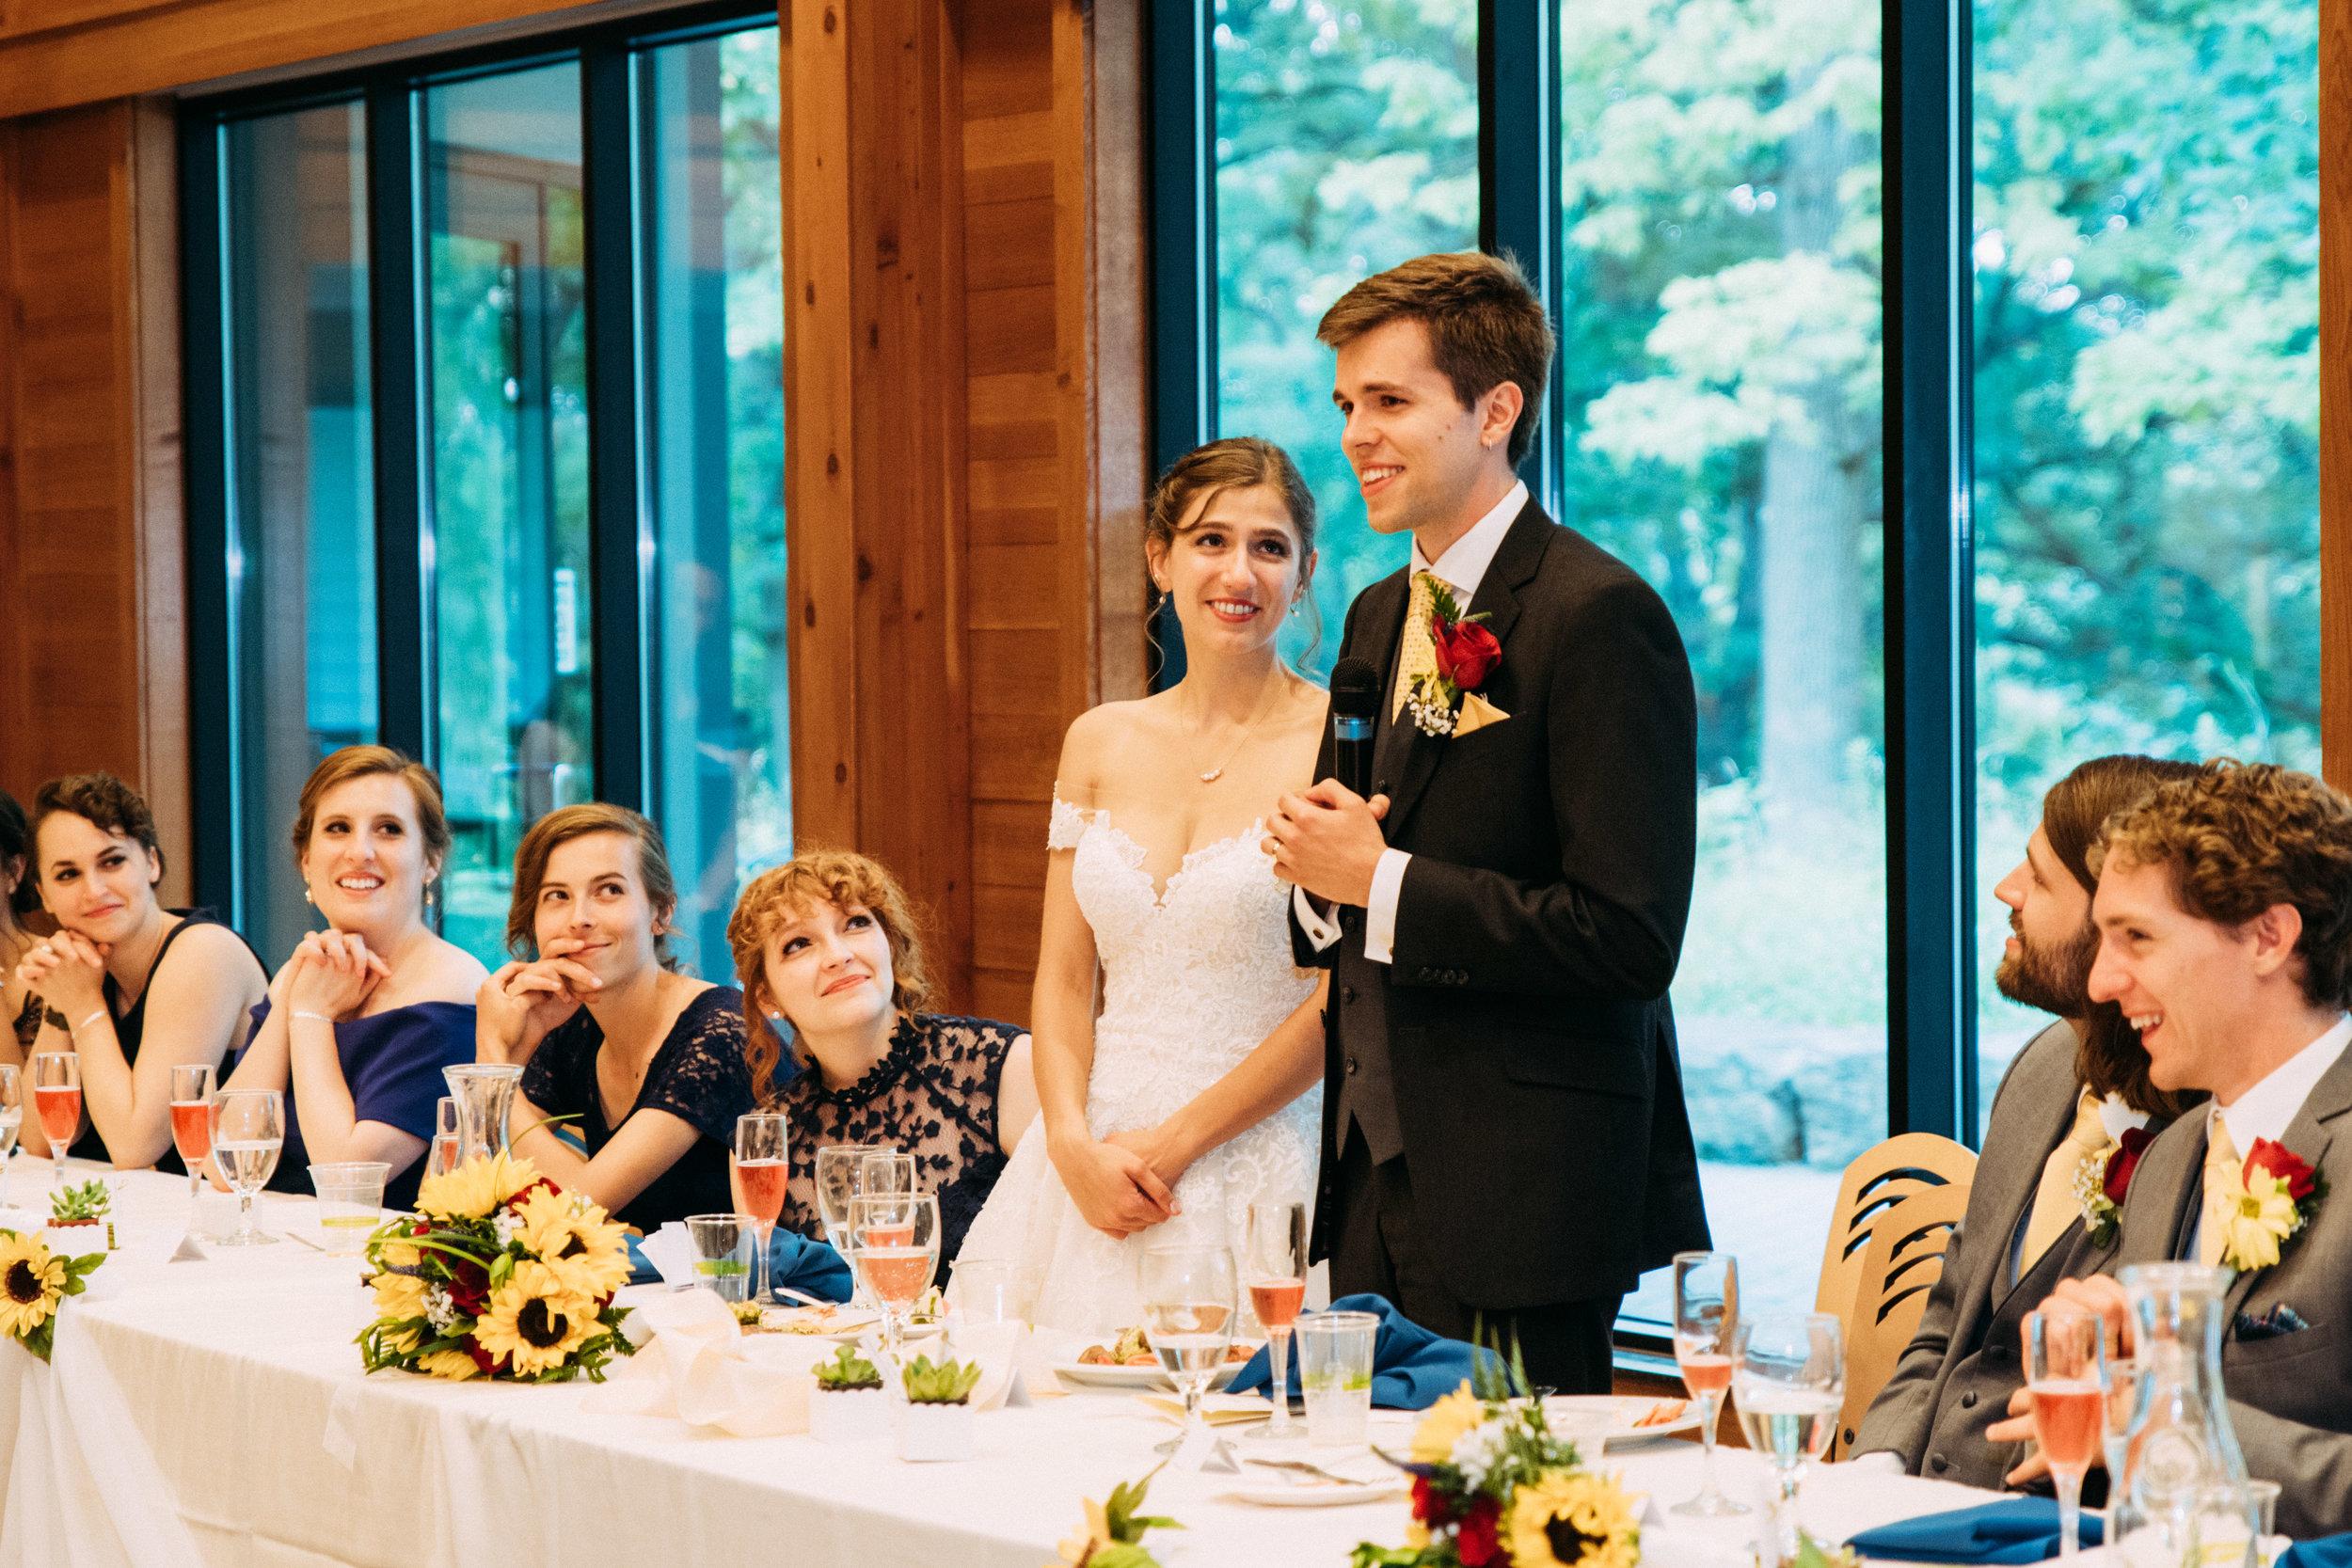 40-Liza_Chris_Minneapolis_Minnesota_Wedding.jpg